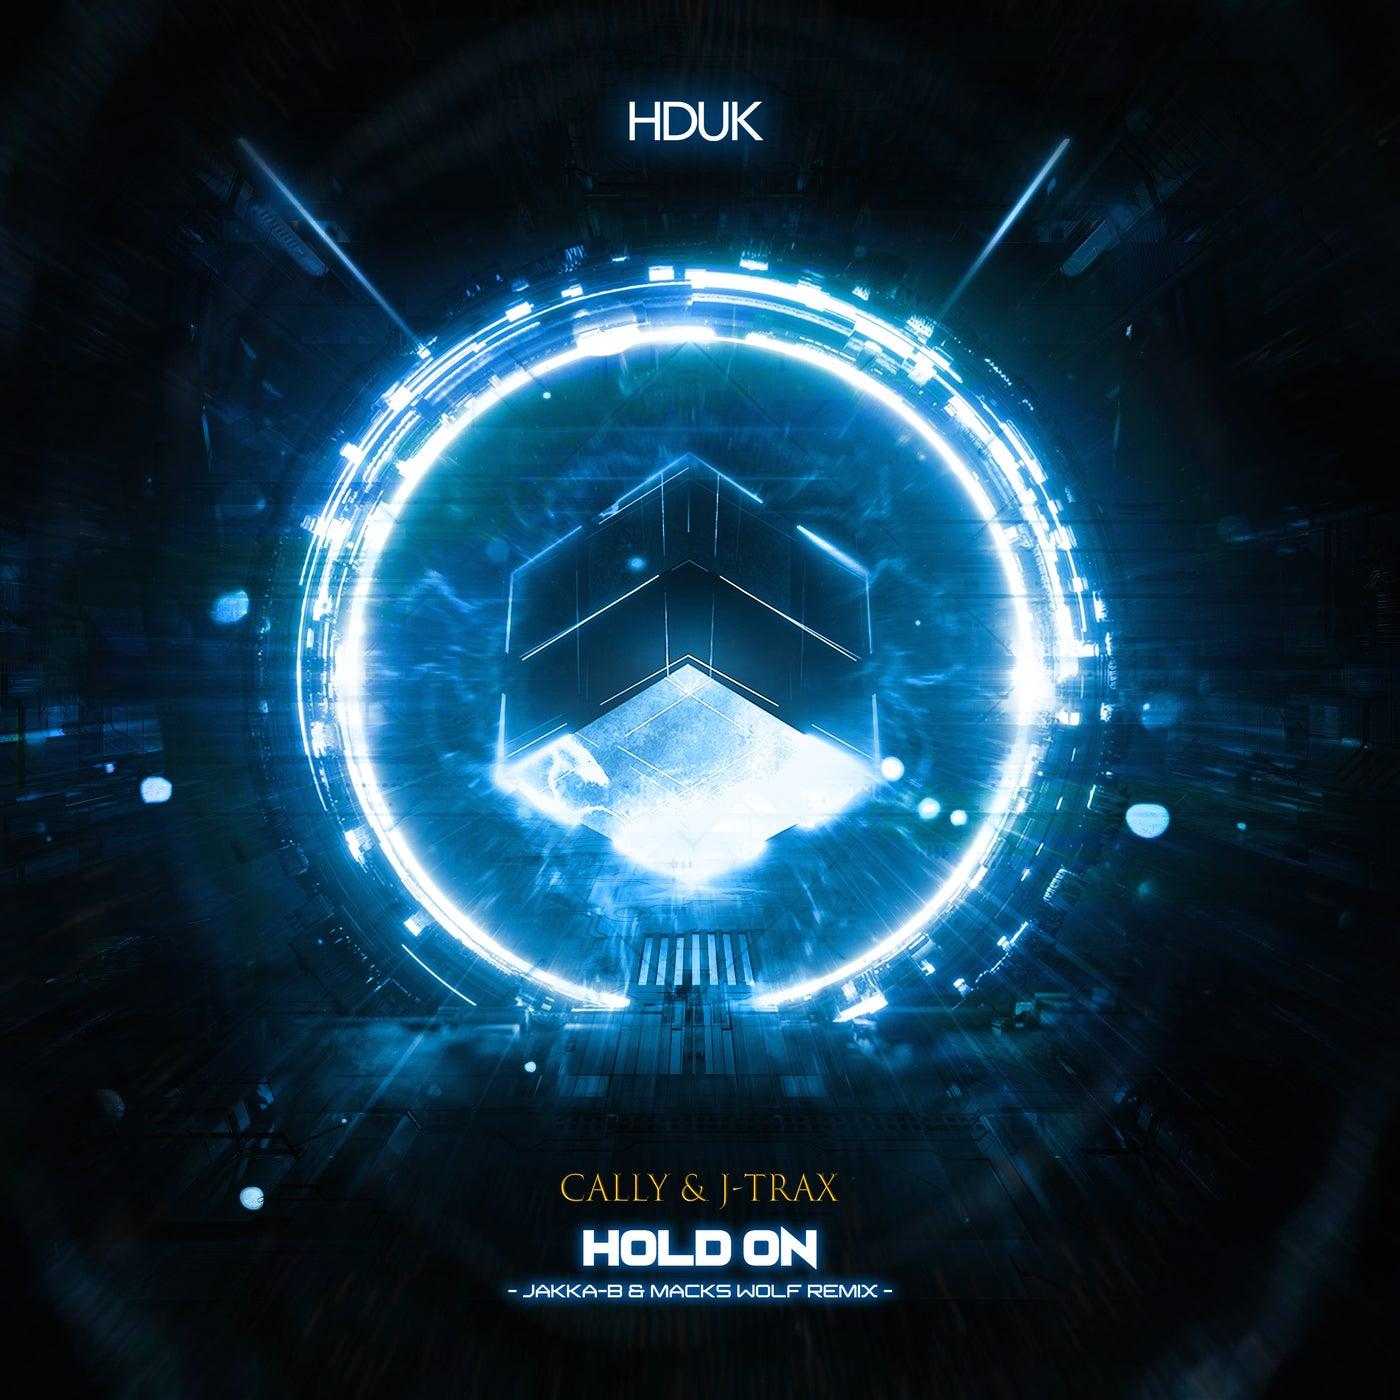 Hold On (Jakka-B & Macks Wolf Remix (Extended Mix))